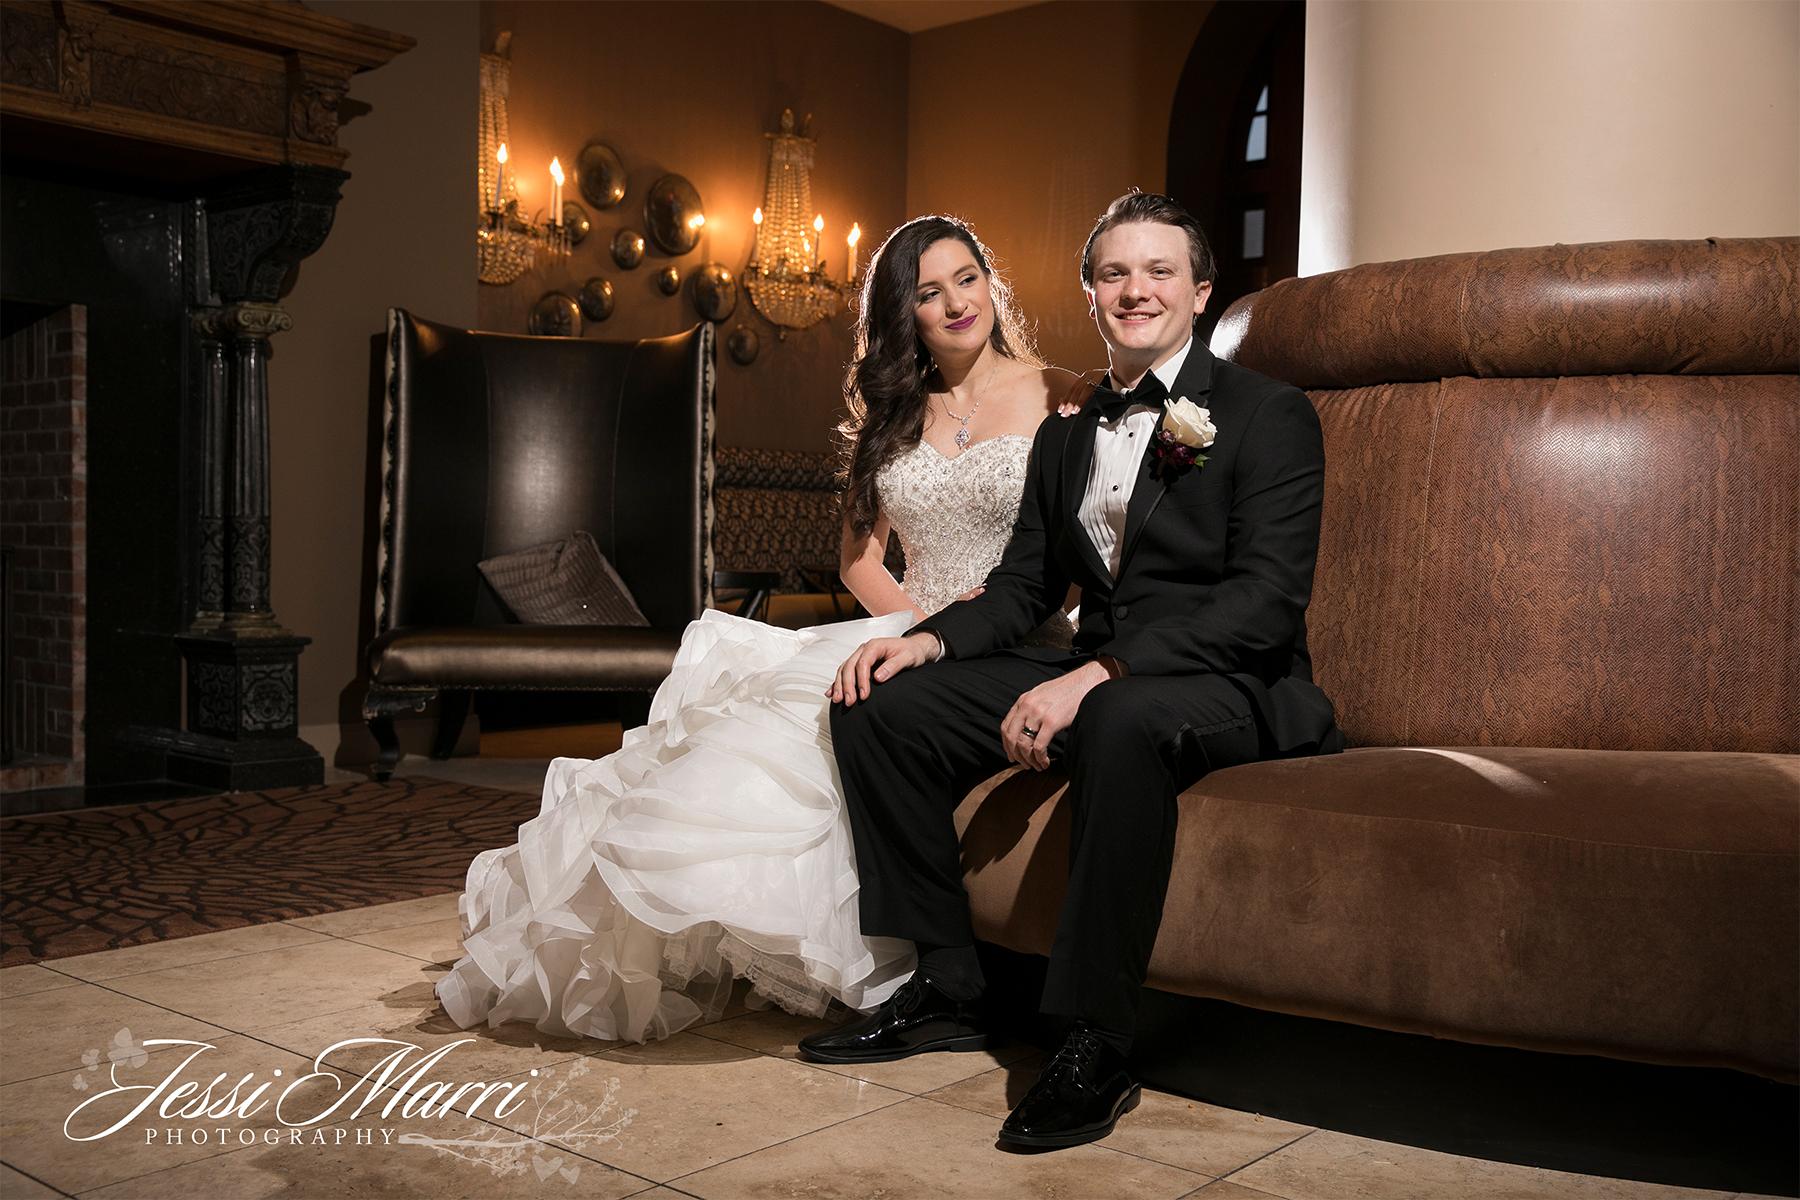 Your Wedding Portraits With Photographers Houston